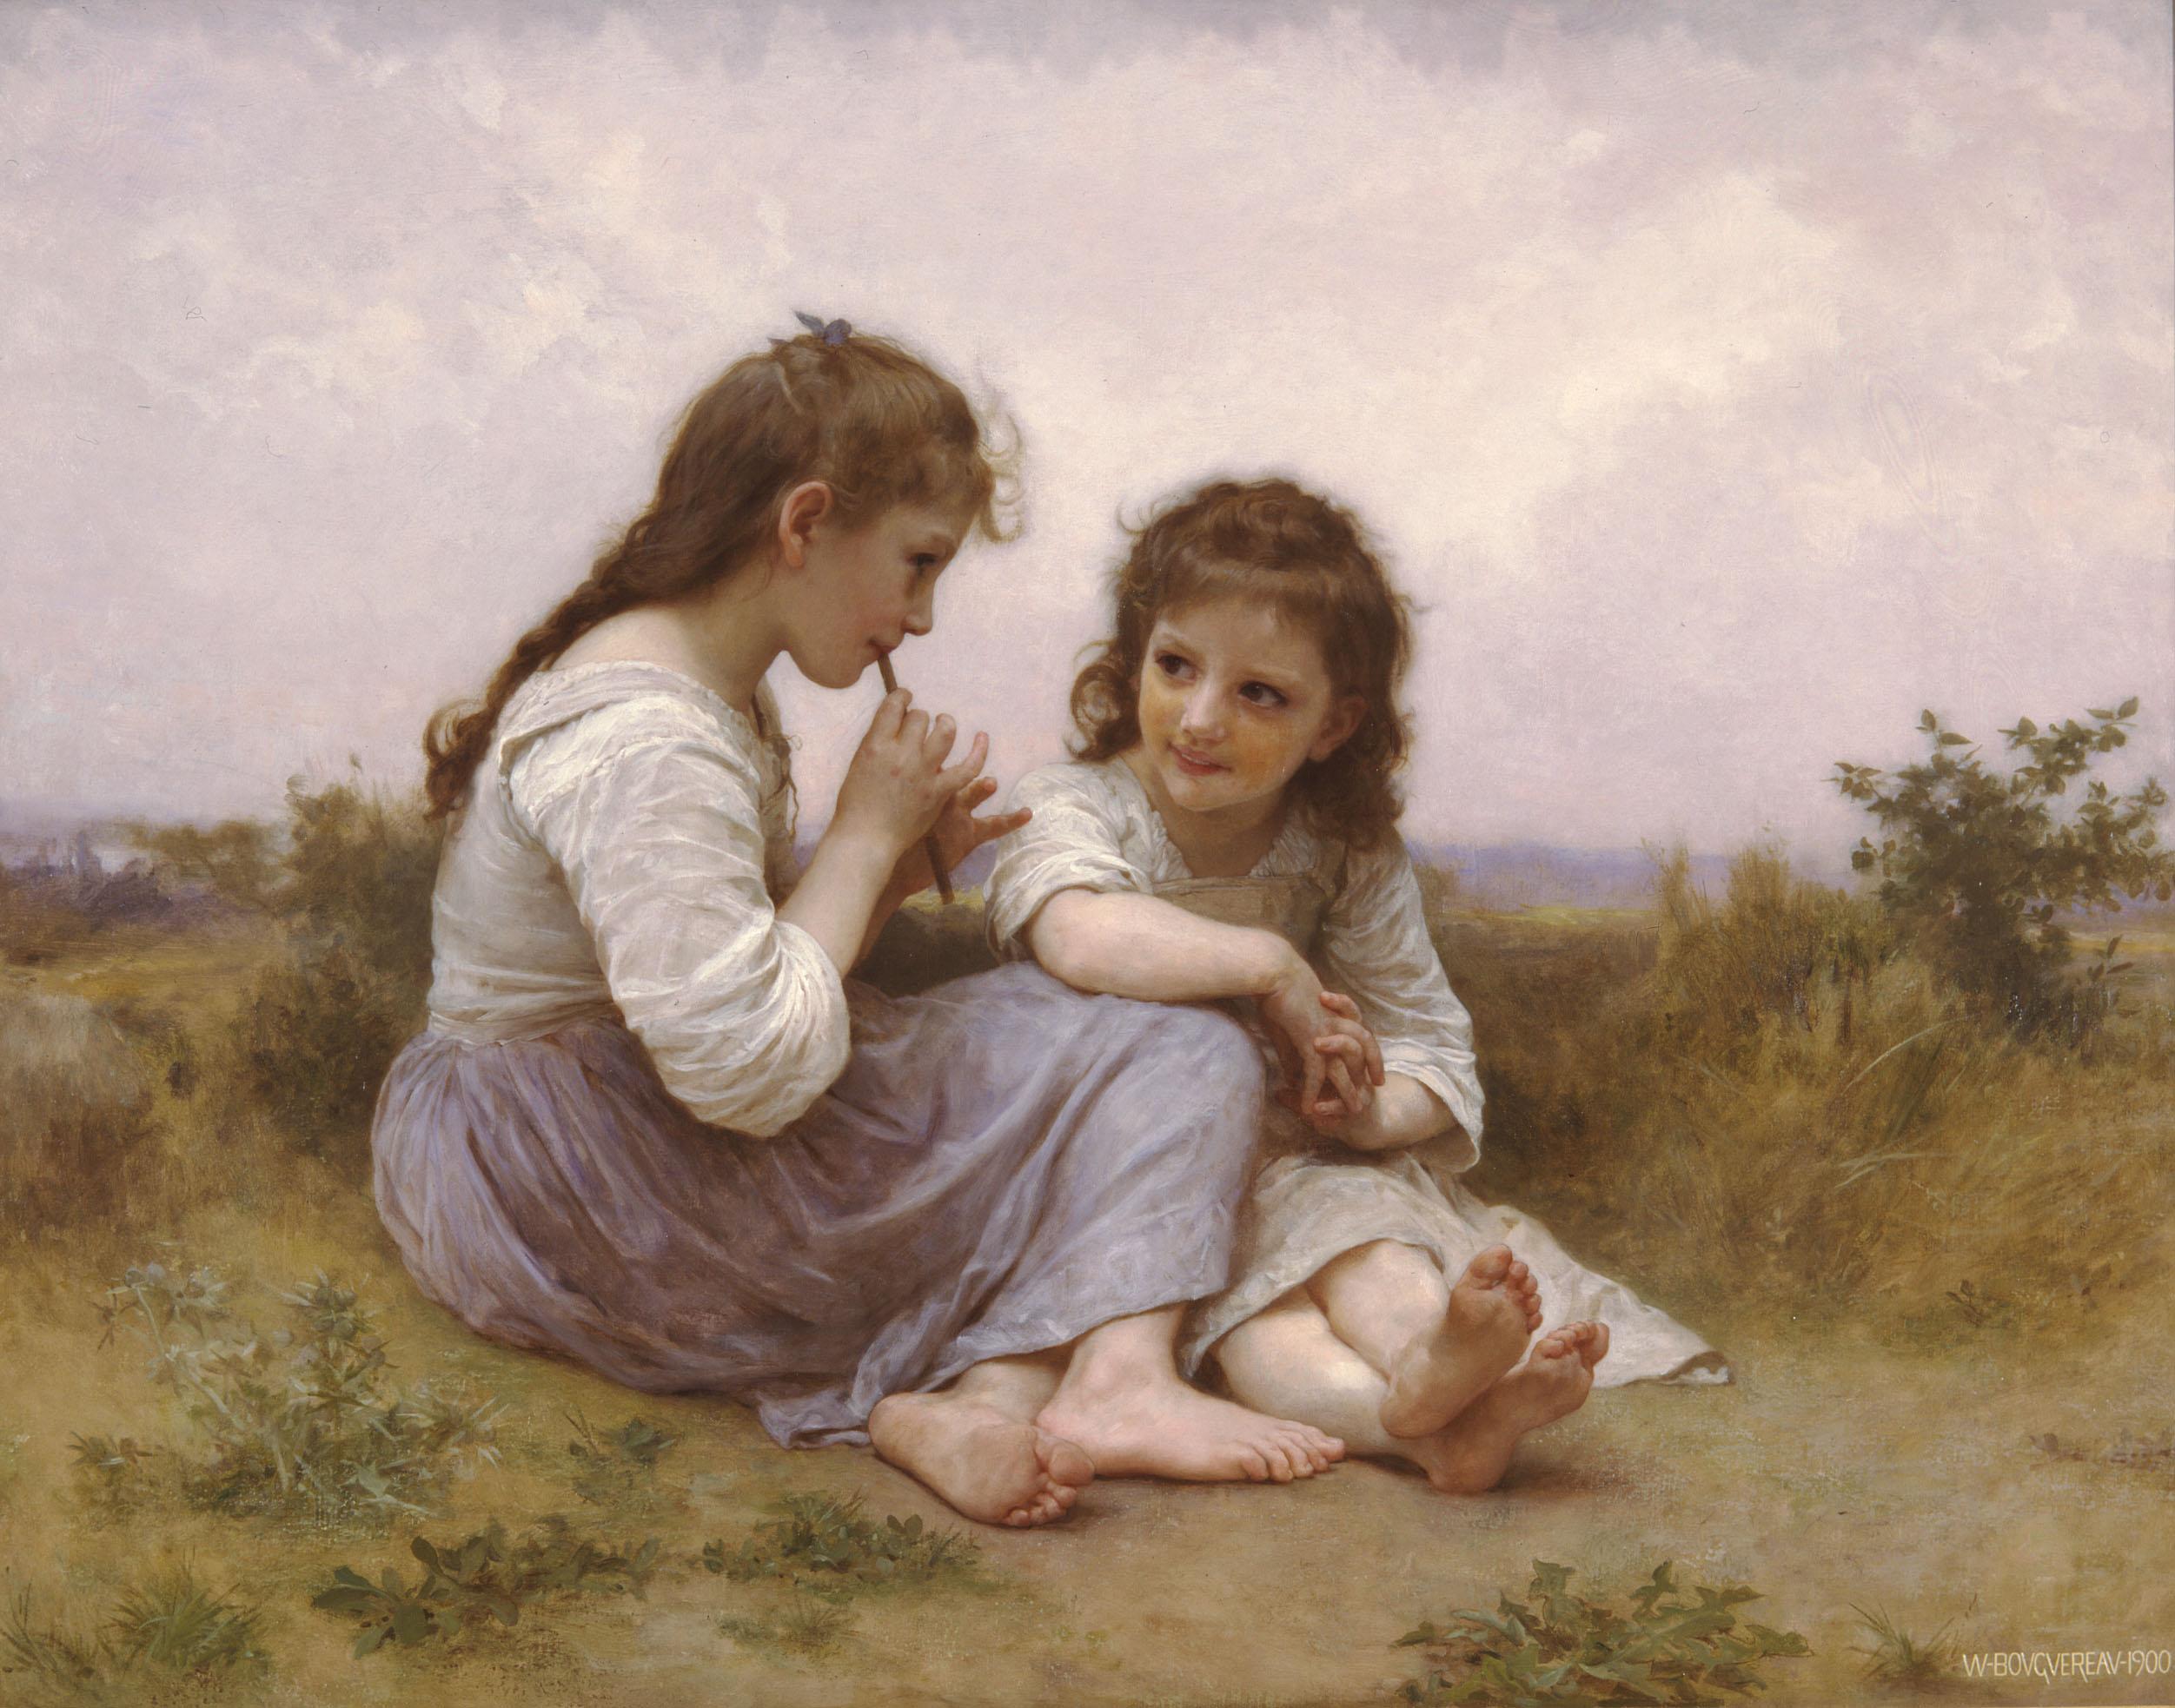 Adorables caritas de niños. A-childhood-idyll-1900